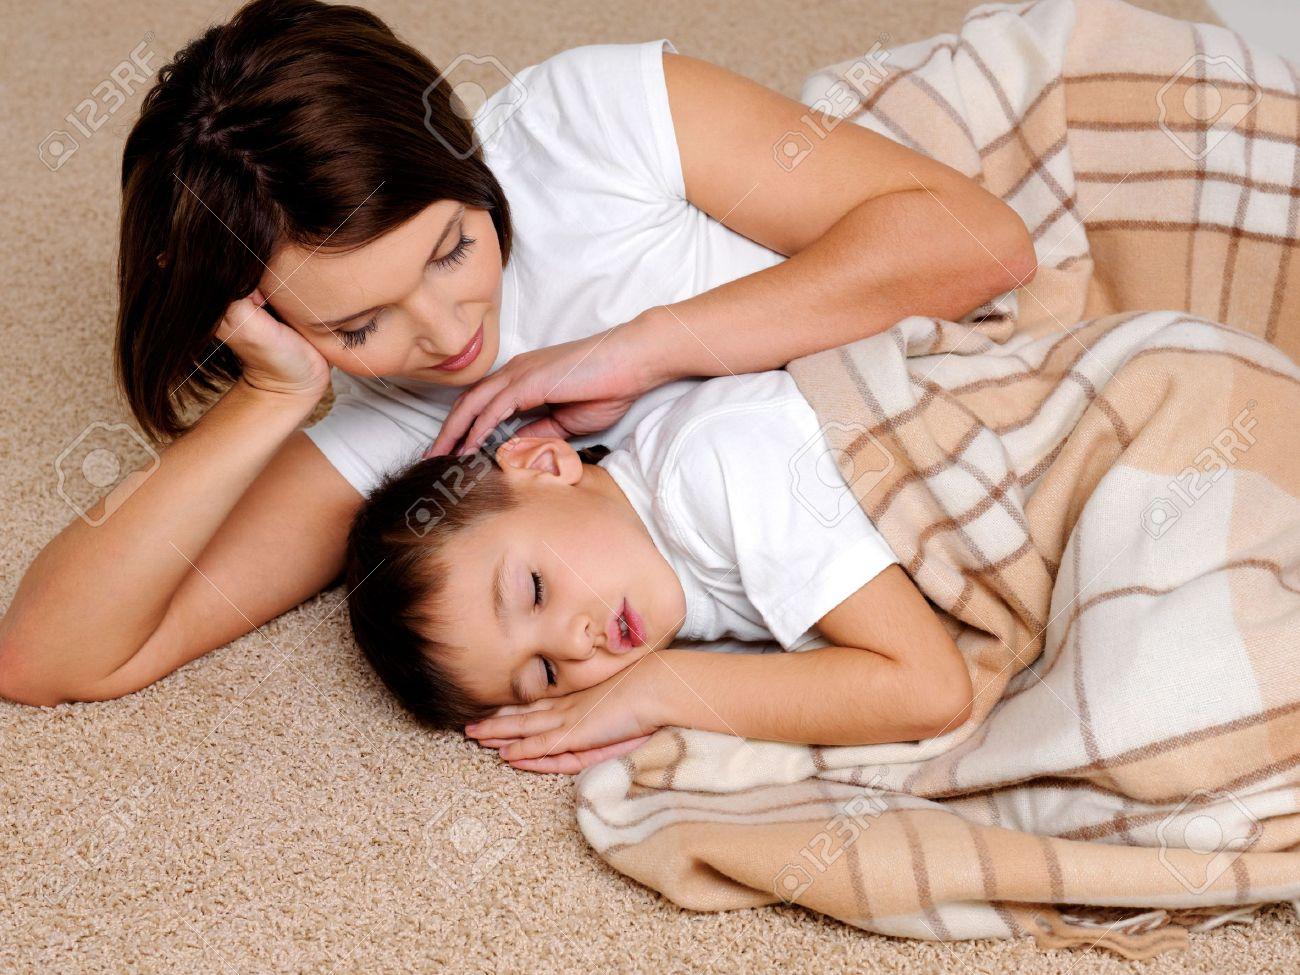 Спящая мать фото 3 фотография